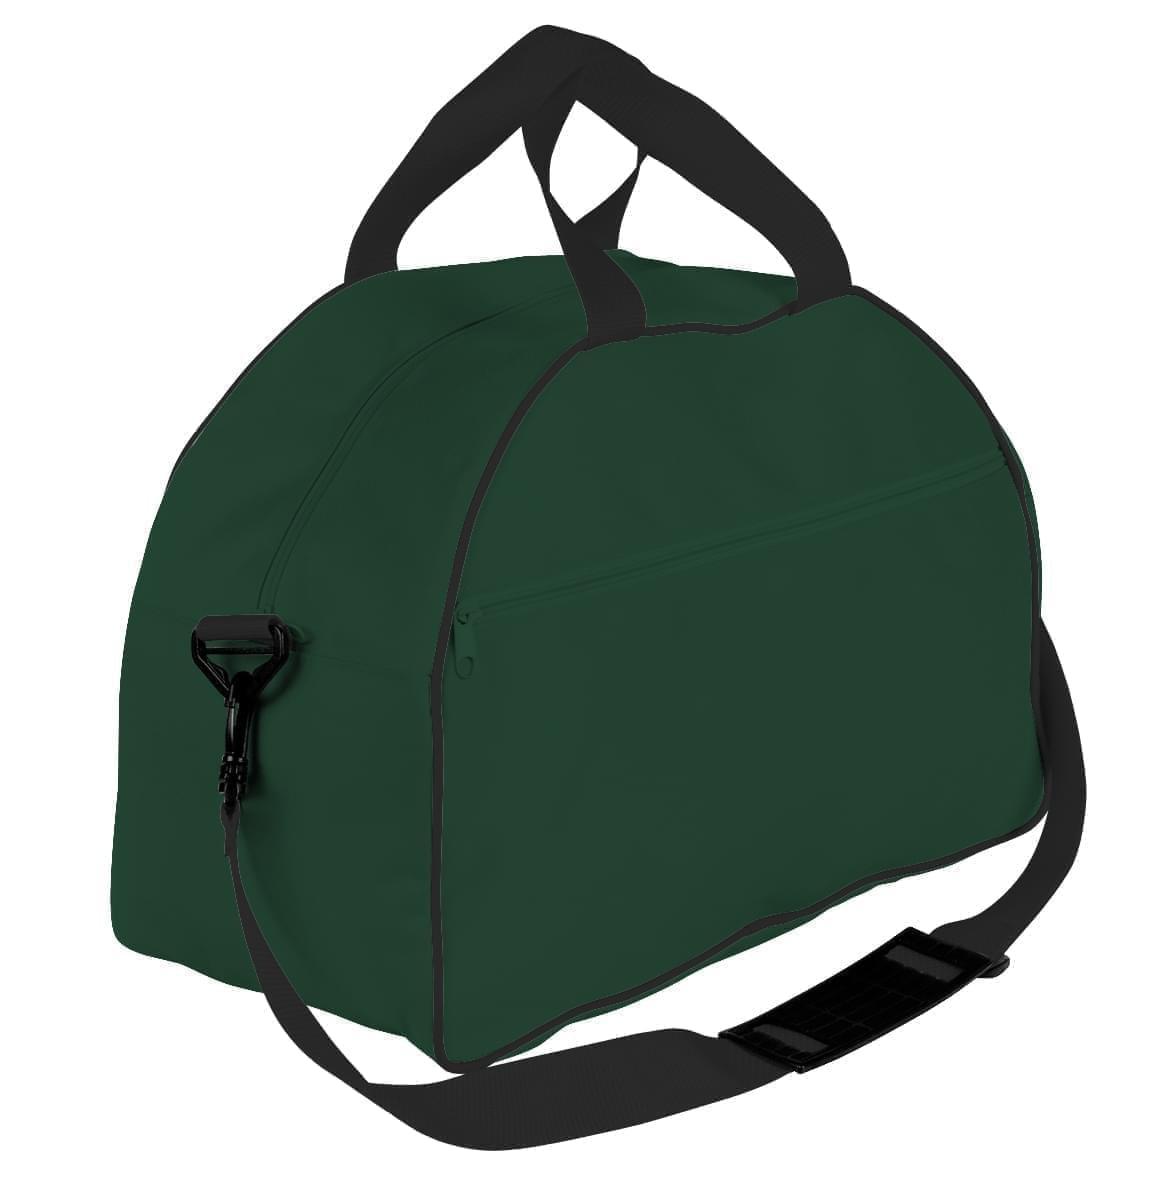 USA Made Nylon Poly Weekender Duffel Bags, Hunter Green-Black, 6PKV32JASR